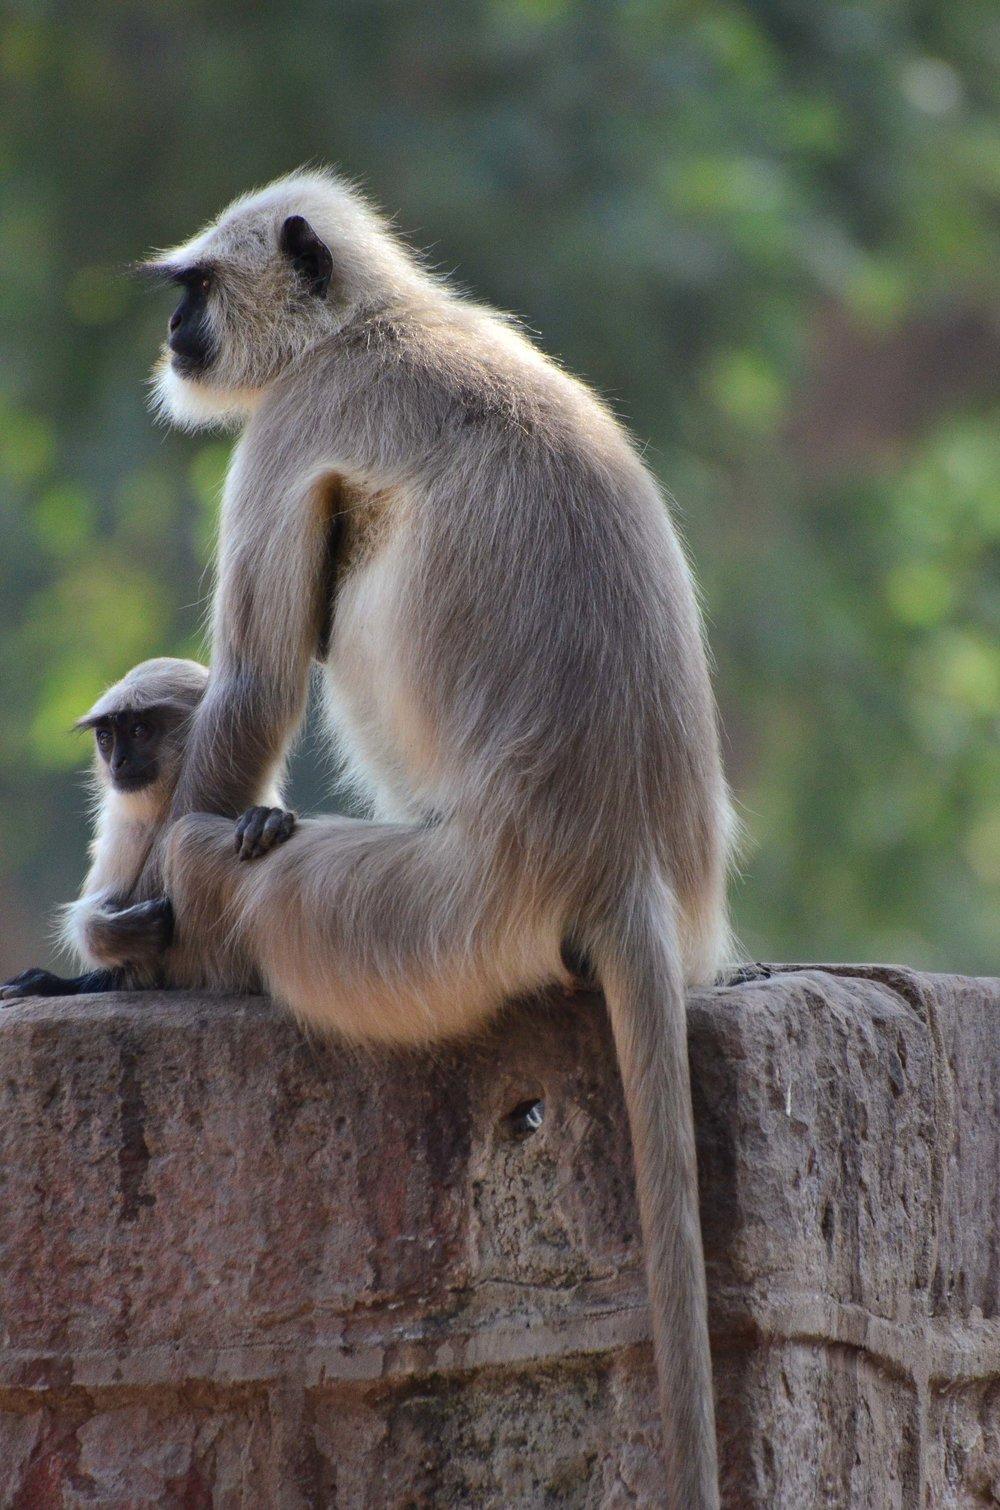 Mom and Baby. Ranthambore National Park, India 2012